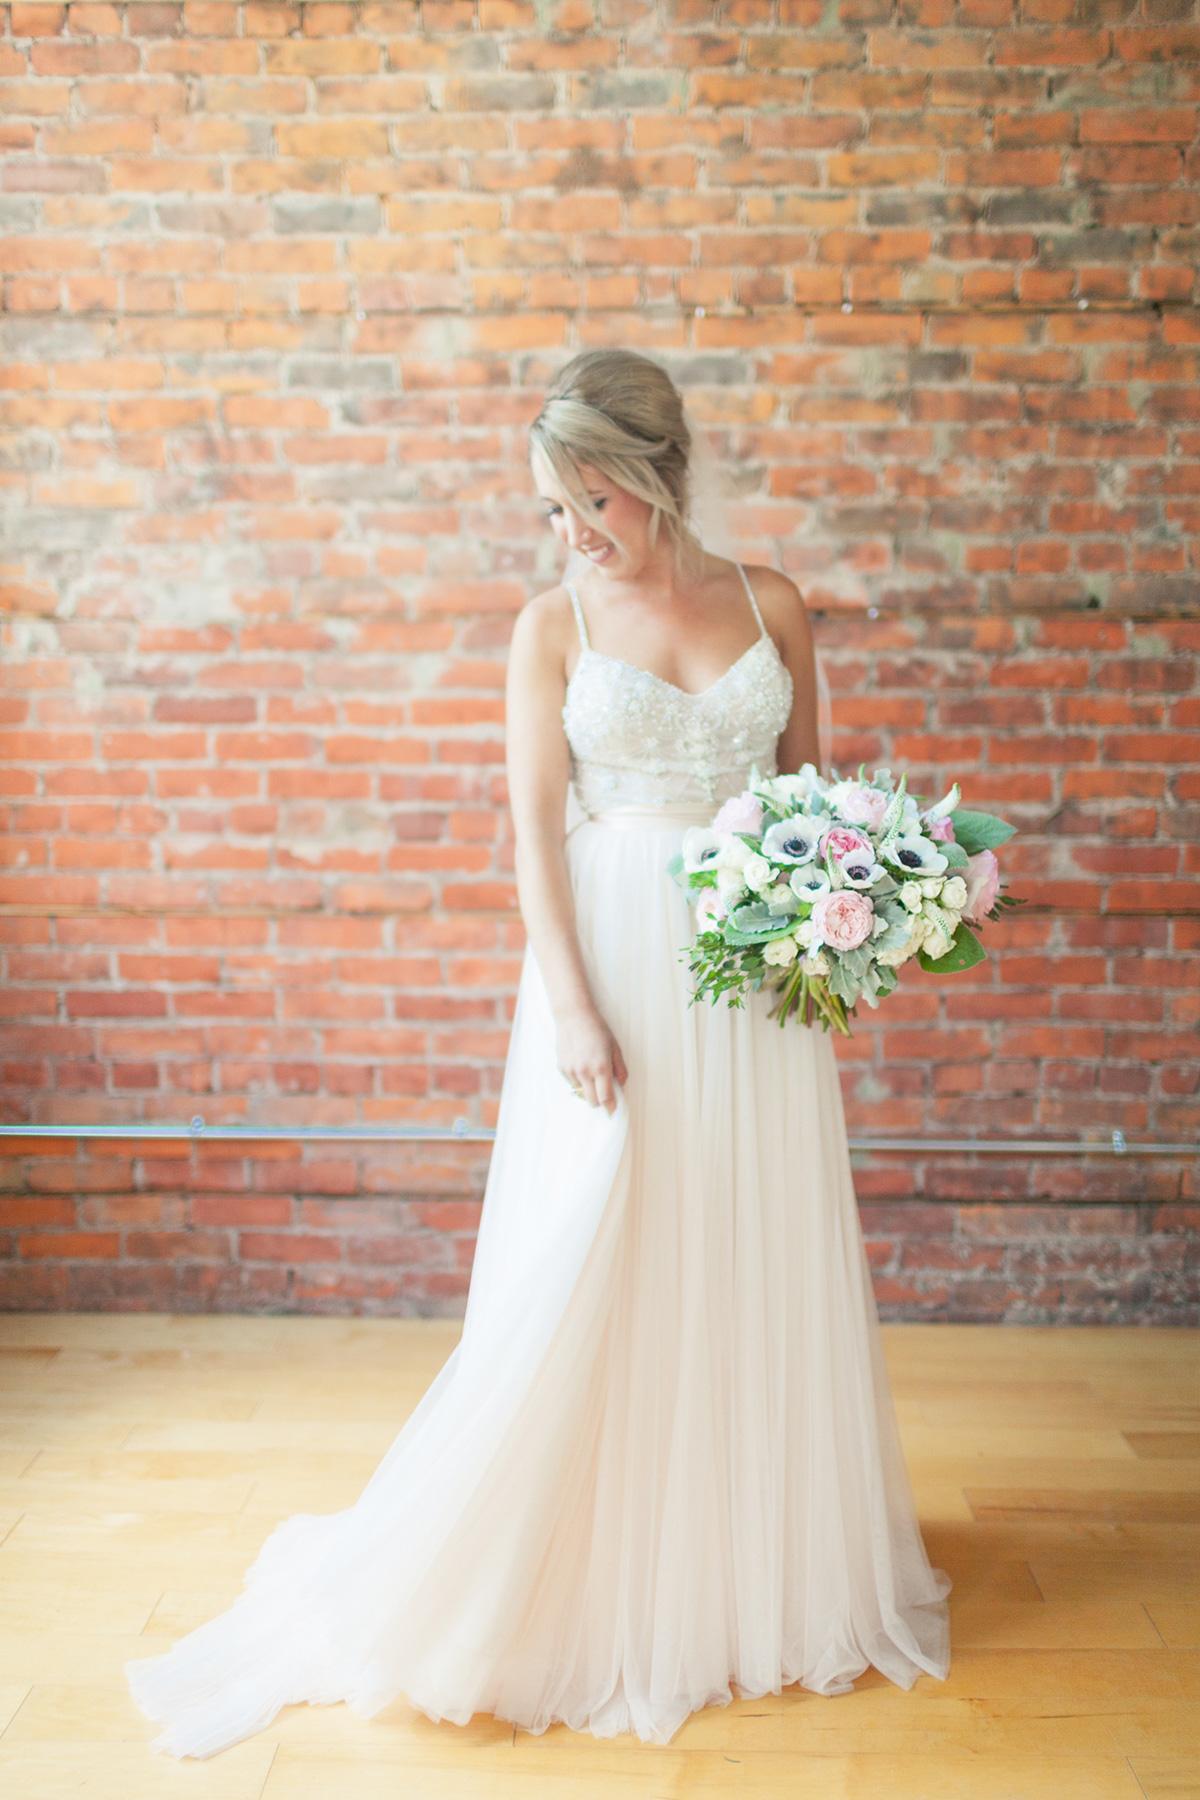 jennifer-xu-photography-vineyard-bride-swish-list-spice-factory-hamilton-wedding-16.jpg